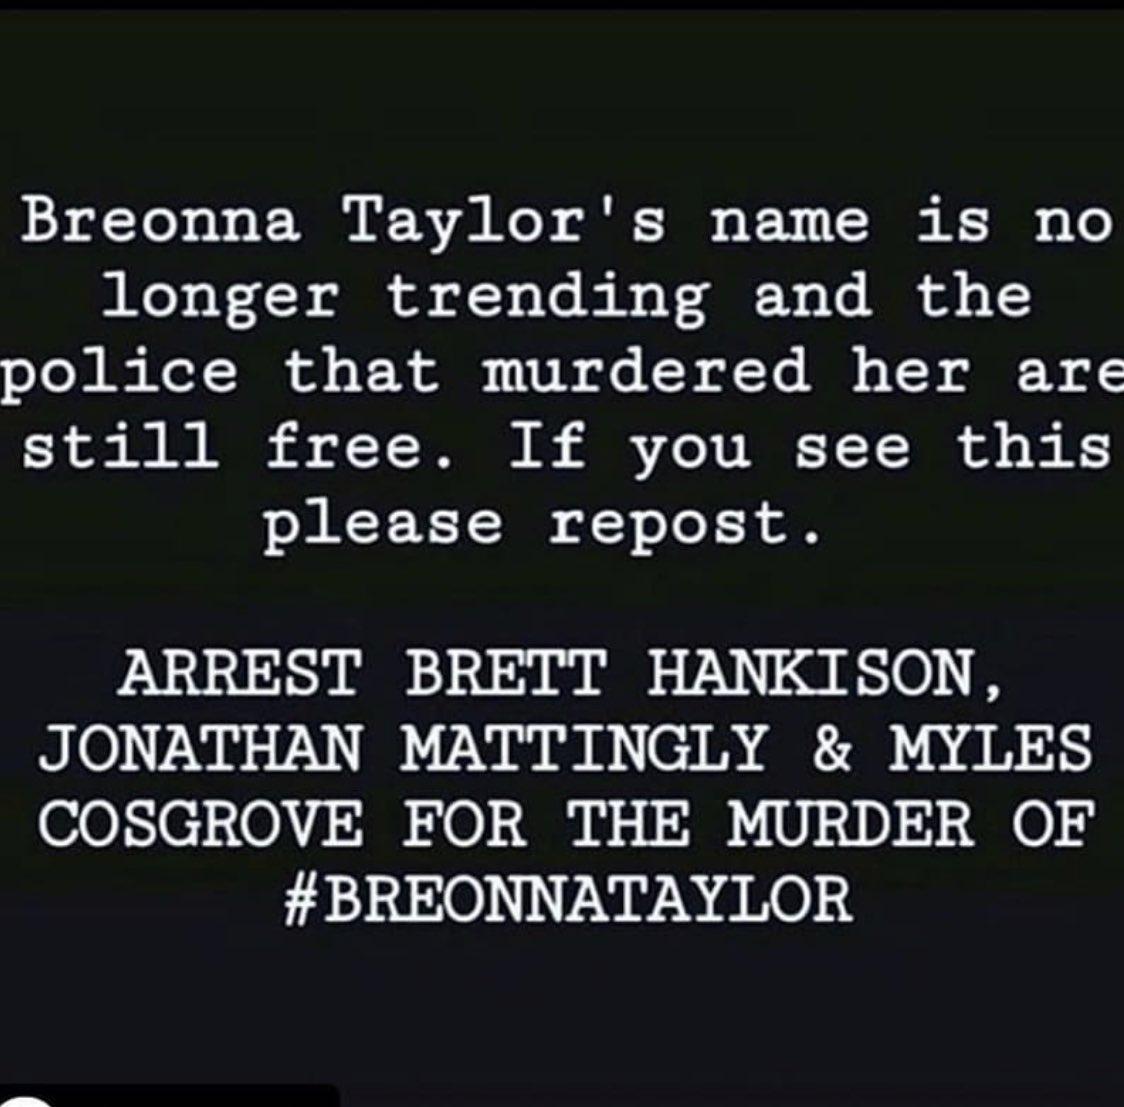 #BreonnaTaylor #JusticeForBreonnaTaylor #breonnataylorwasmurdered